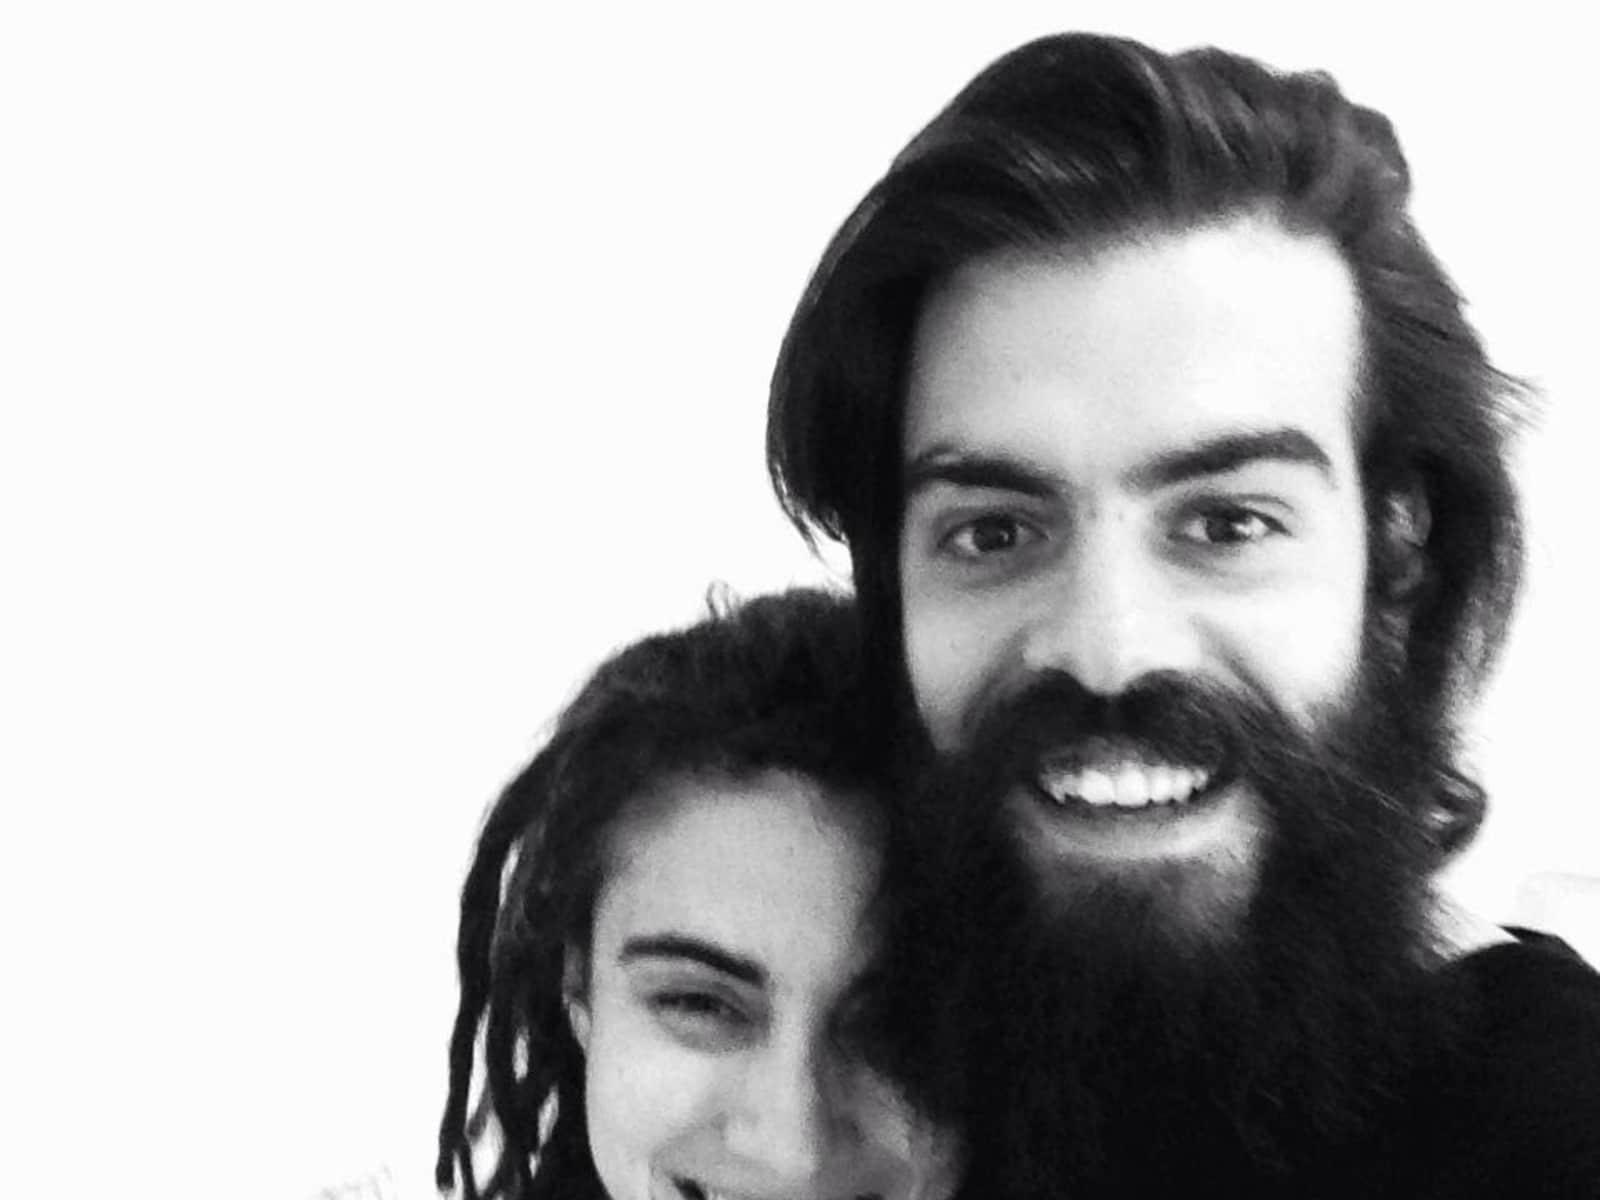 Ana & Miguel from Manhattan, Kansas, United States